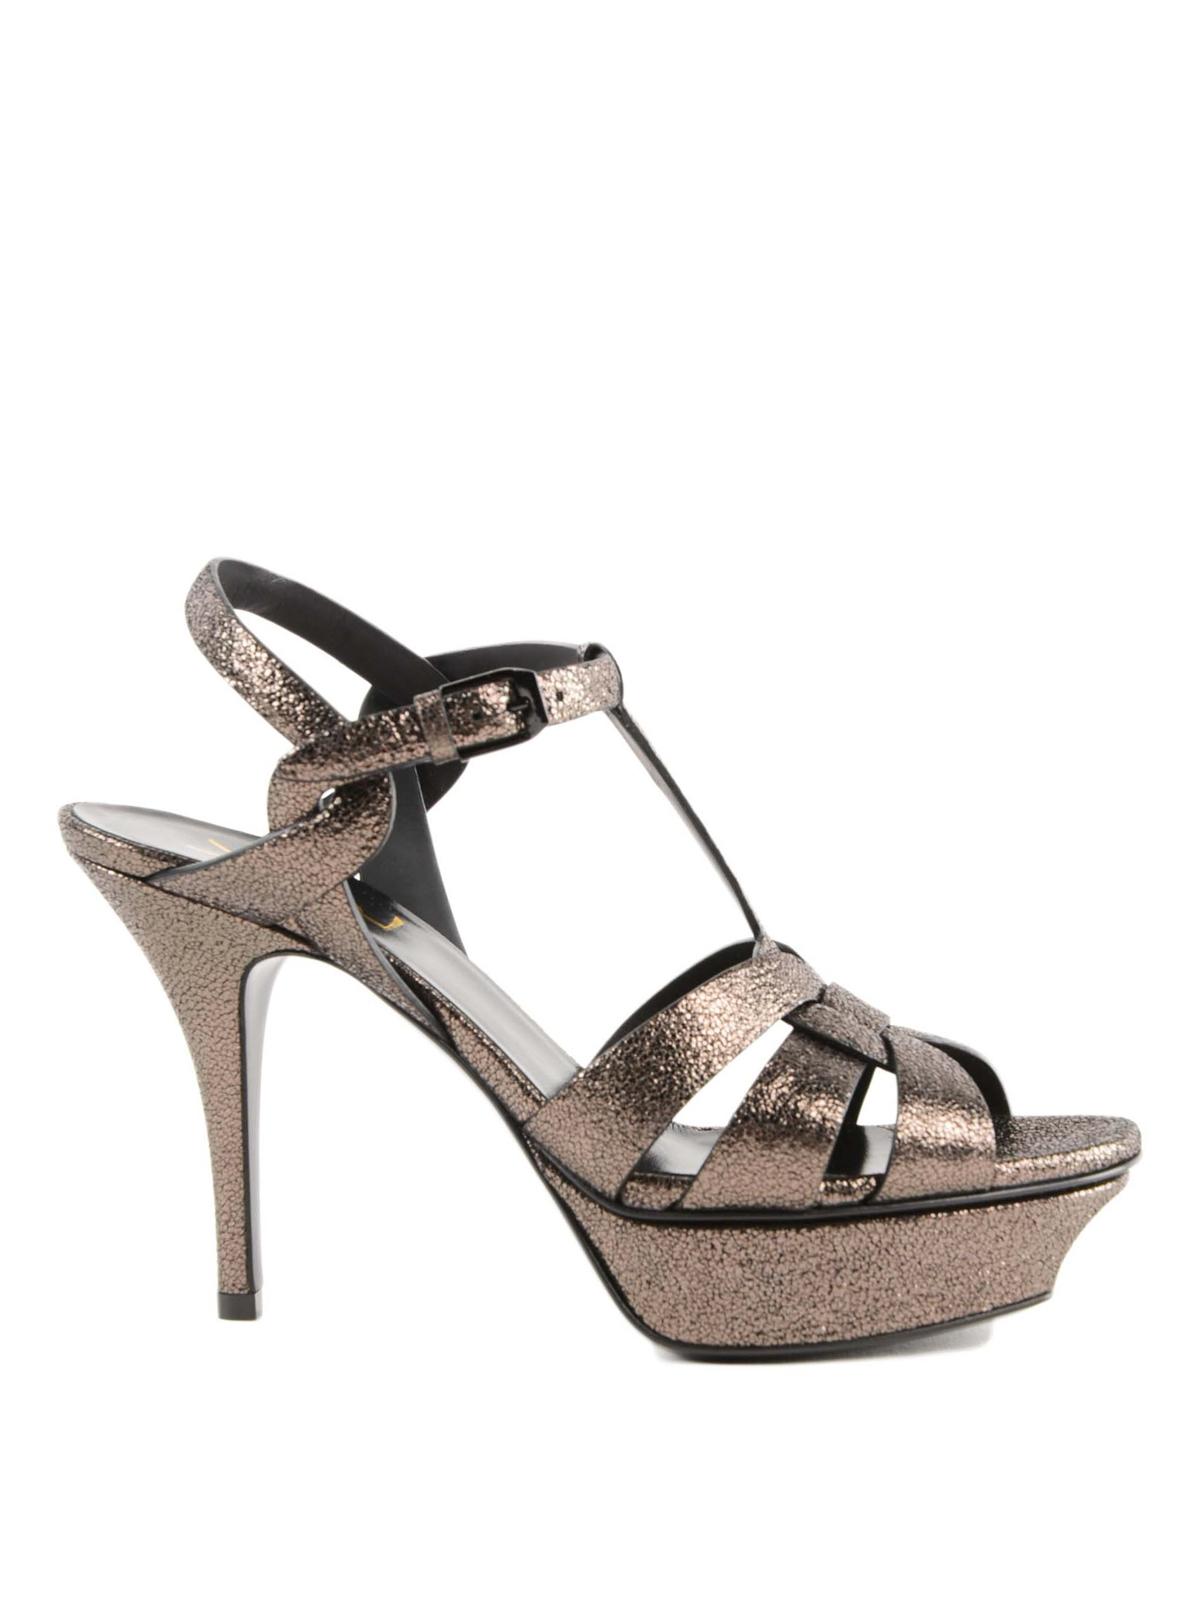 55bf1b736ba829 Saint Laurent - Tribute metallic leather platform sandals - sandals ...